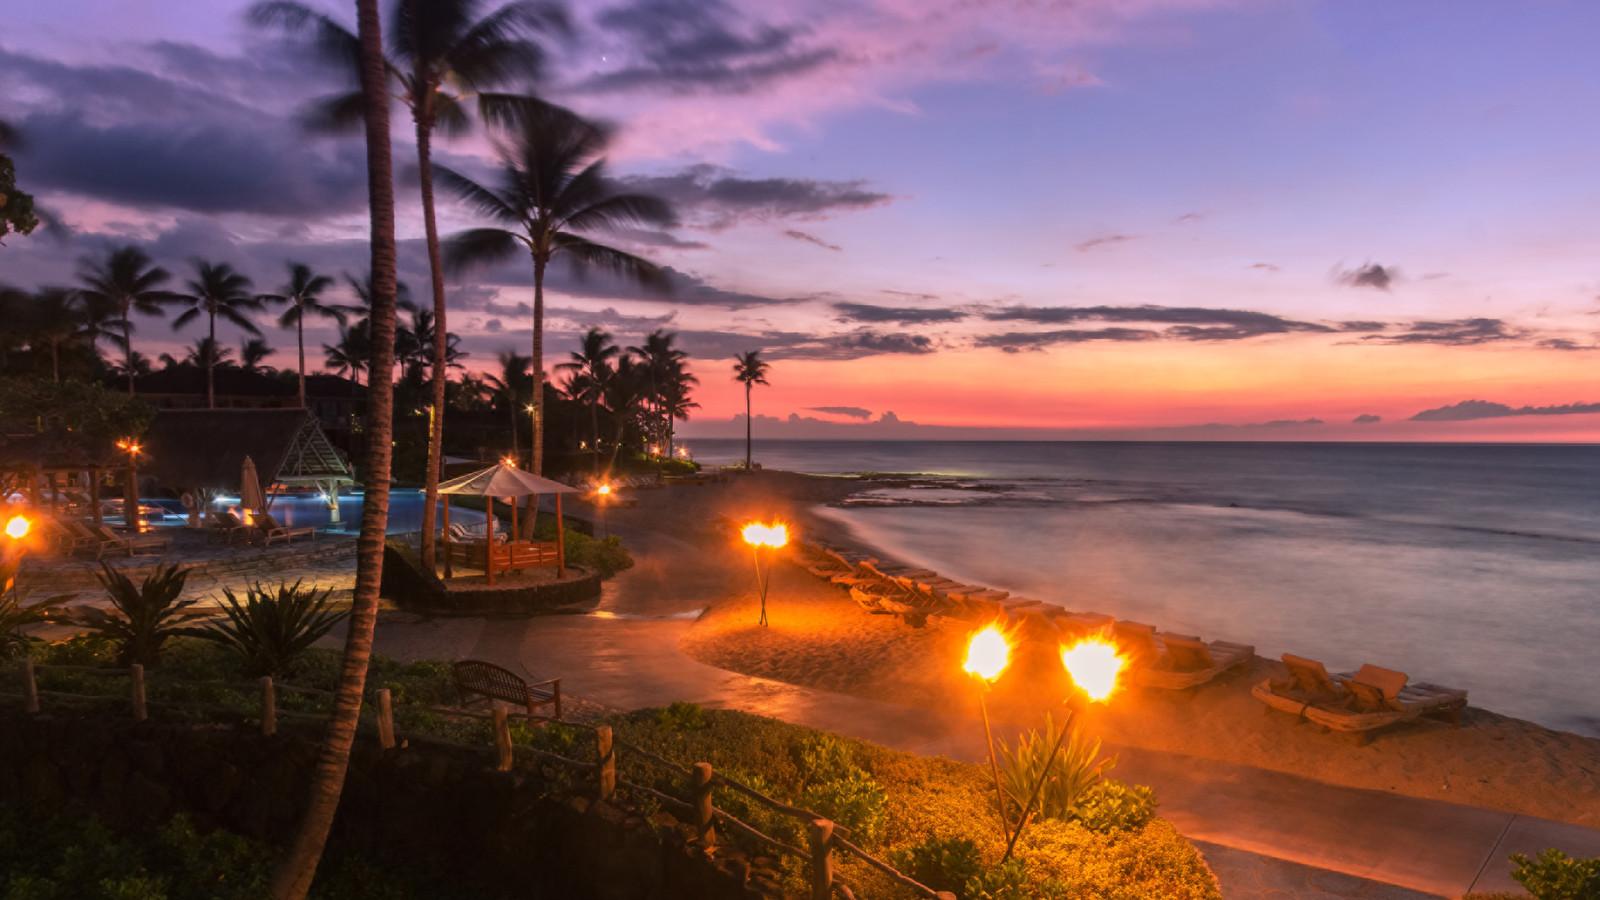 news-main-four-seasons-resort-hualalai-lauches-live-from-hualalai-video-broadcast-series-on-social-media.1586857461.jpg